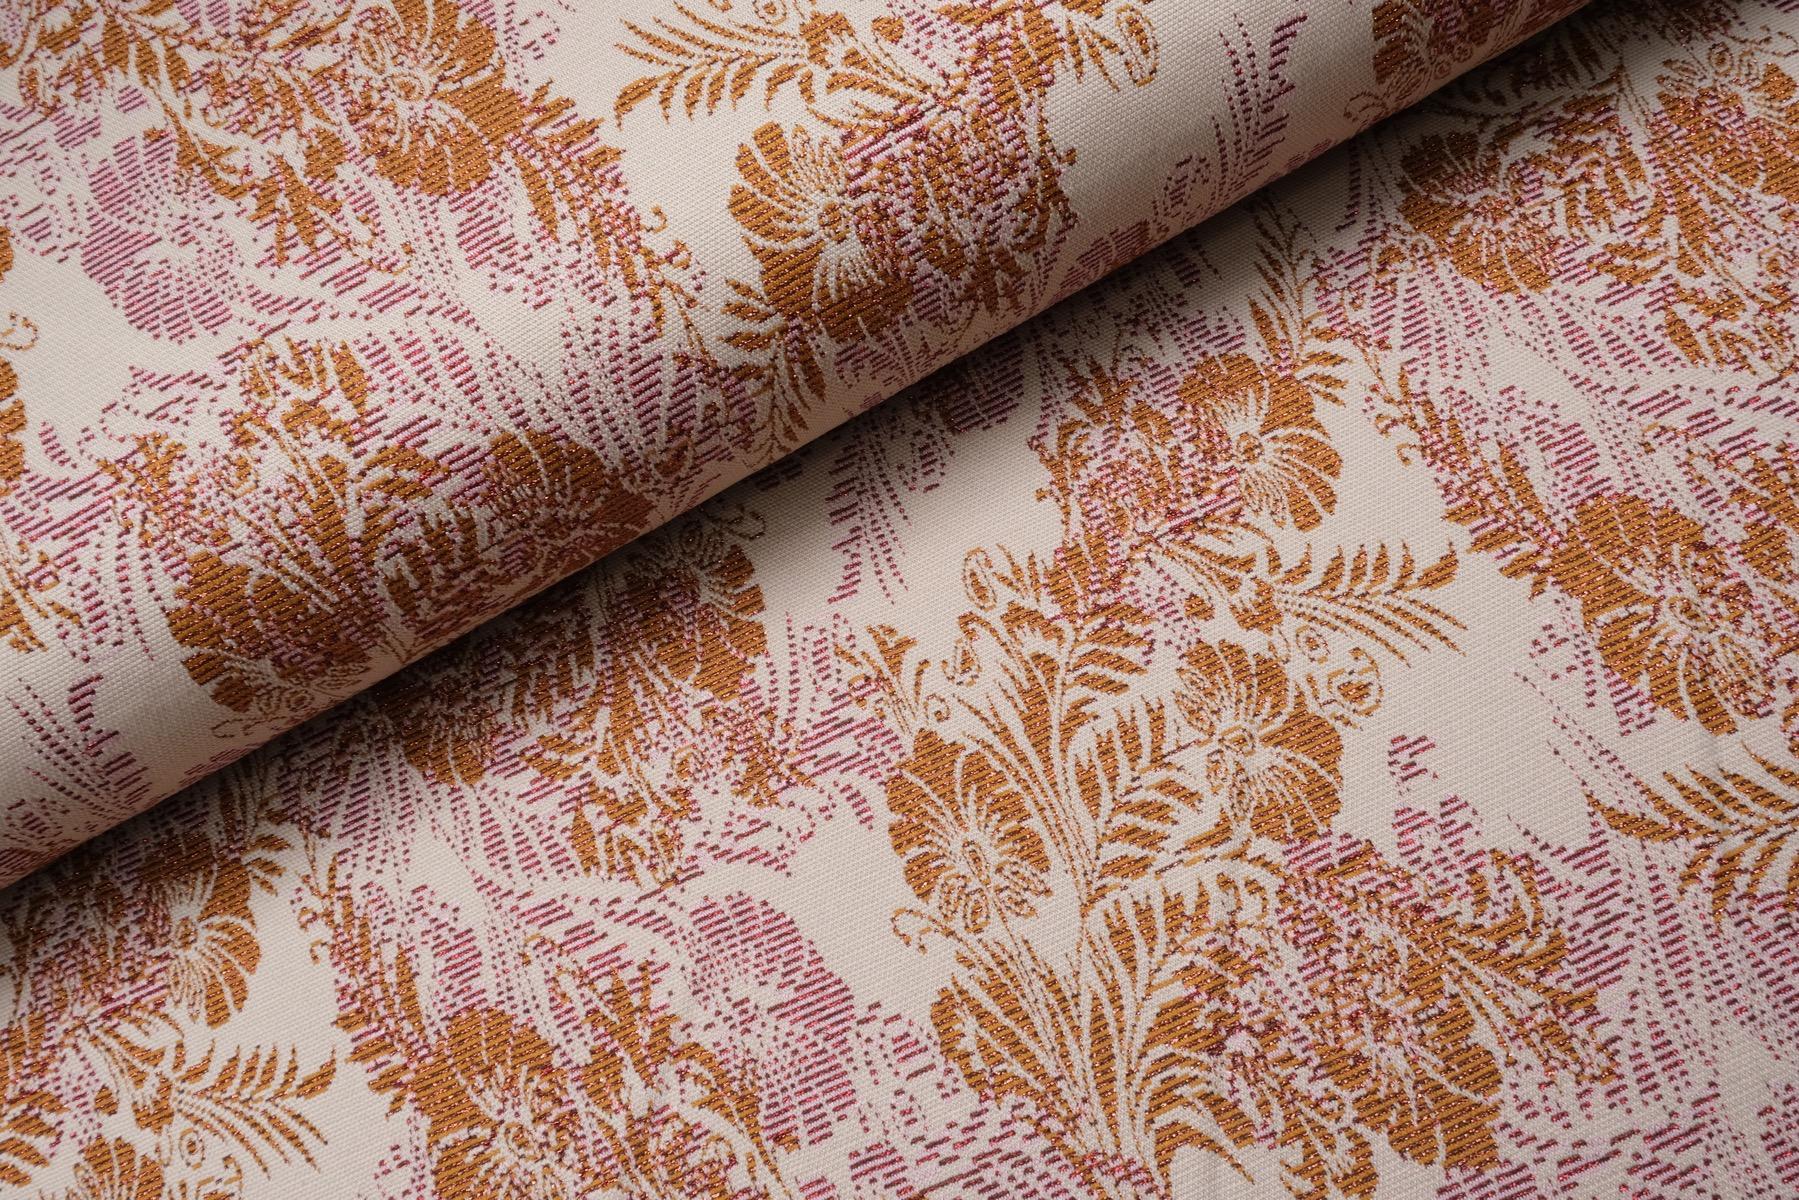 Floraly Jacquard Creme / Brons